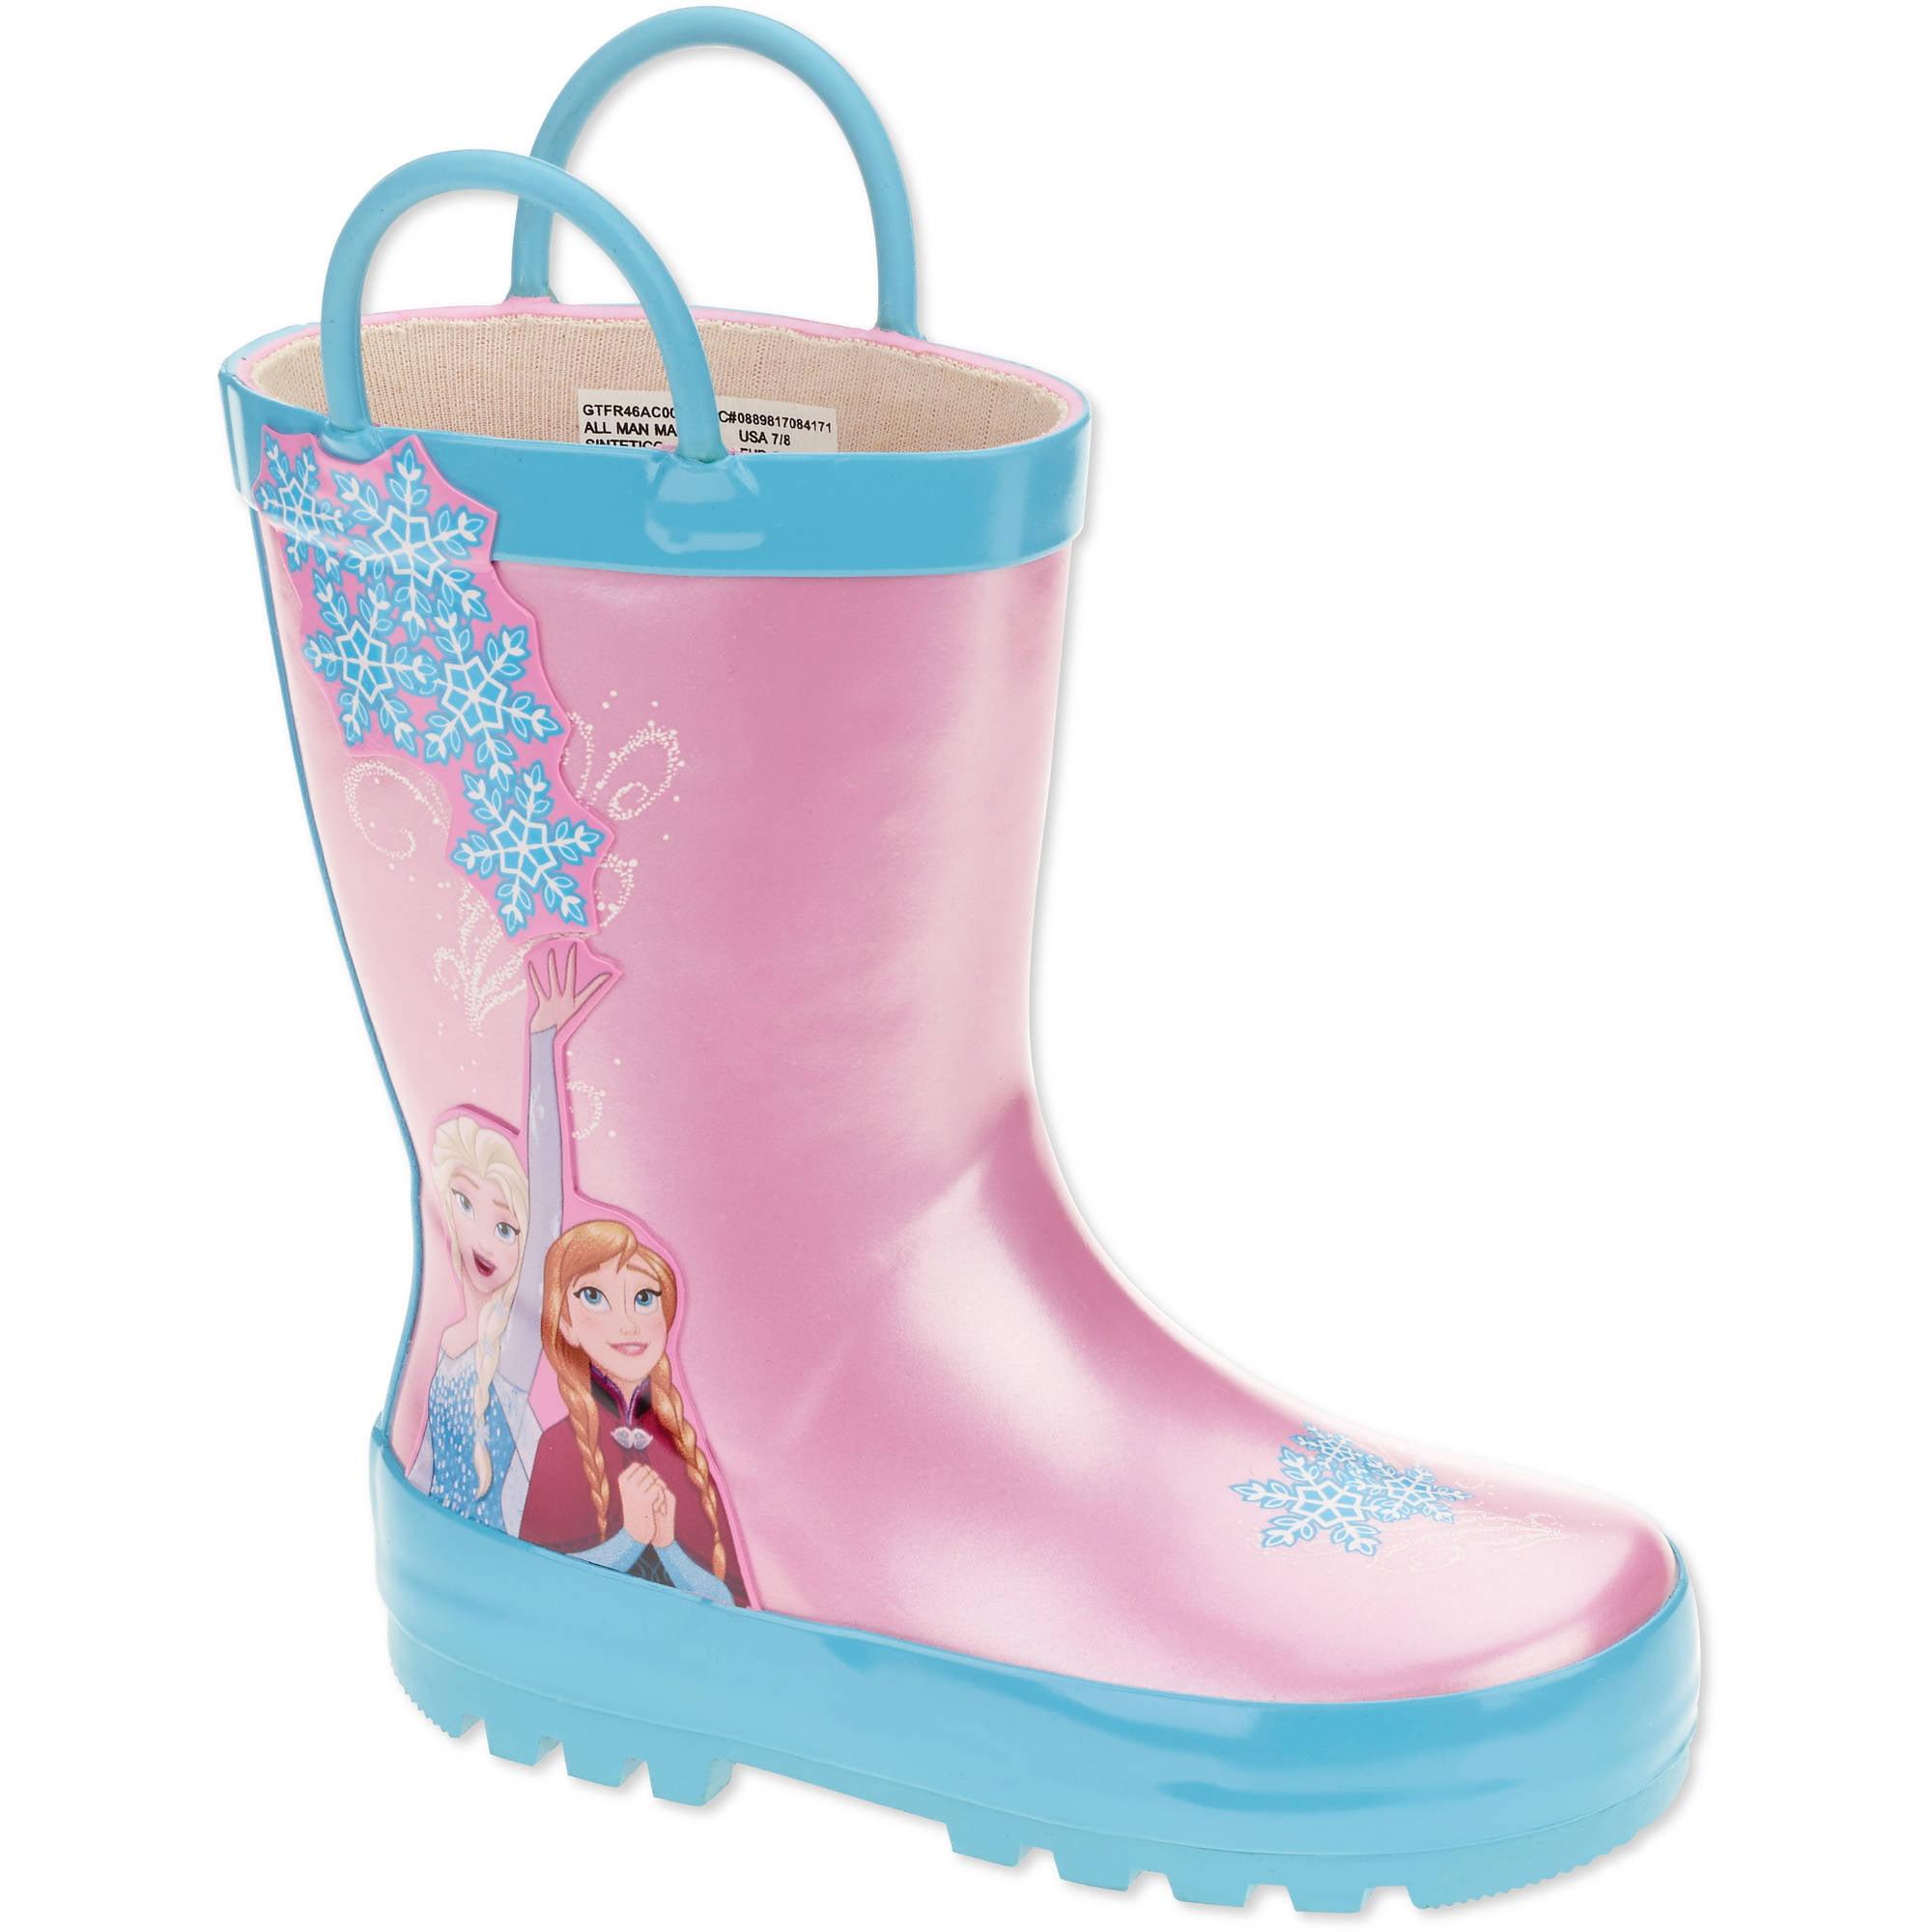 Toddler Rain Boot - Walmart